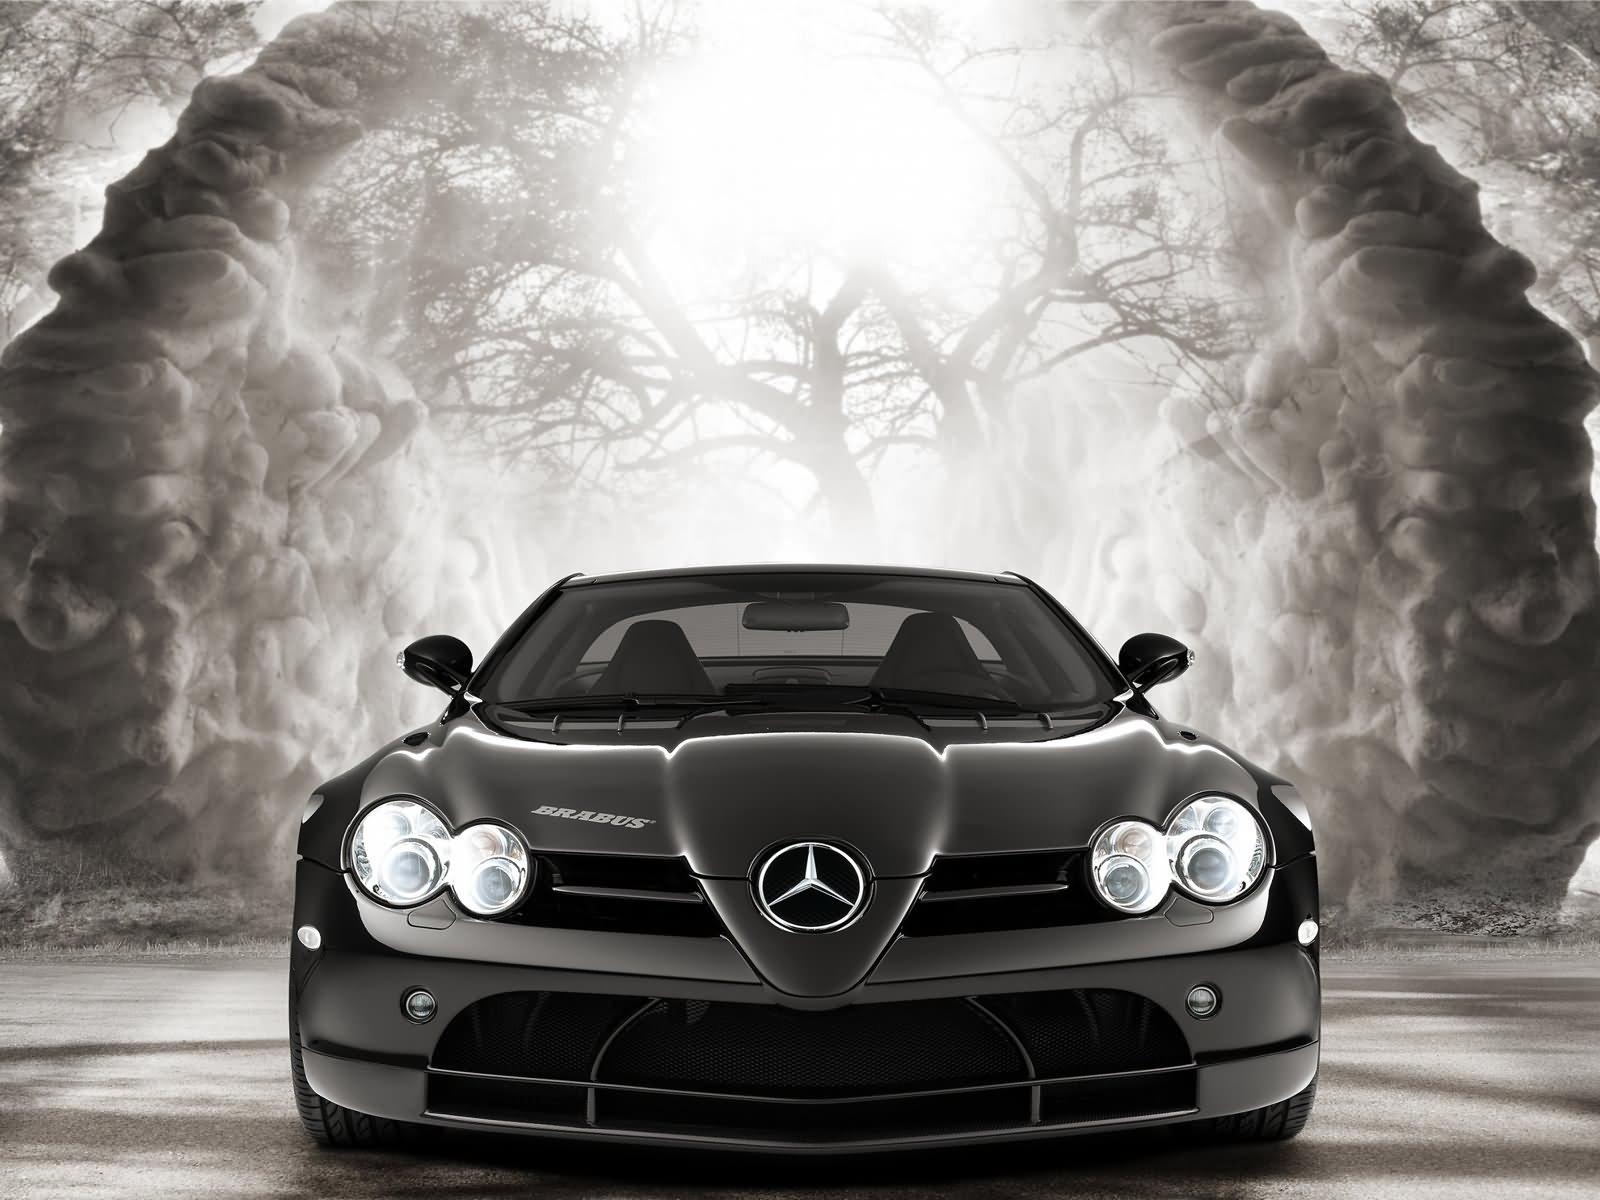 Mercedes Benz Computer Wallpaper Pictures Car Wallpapers